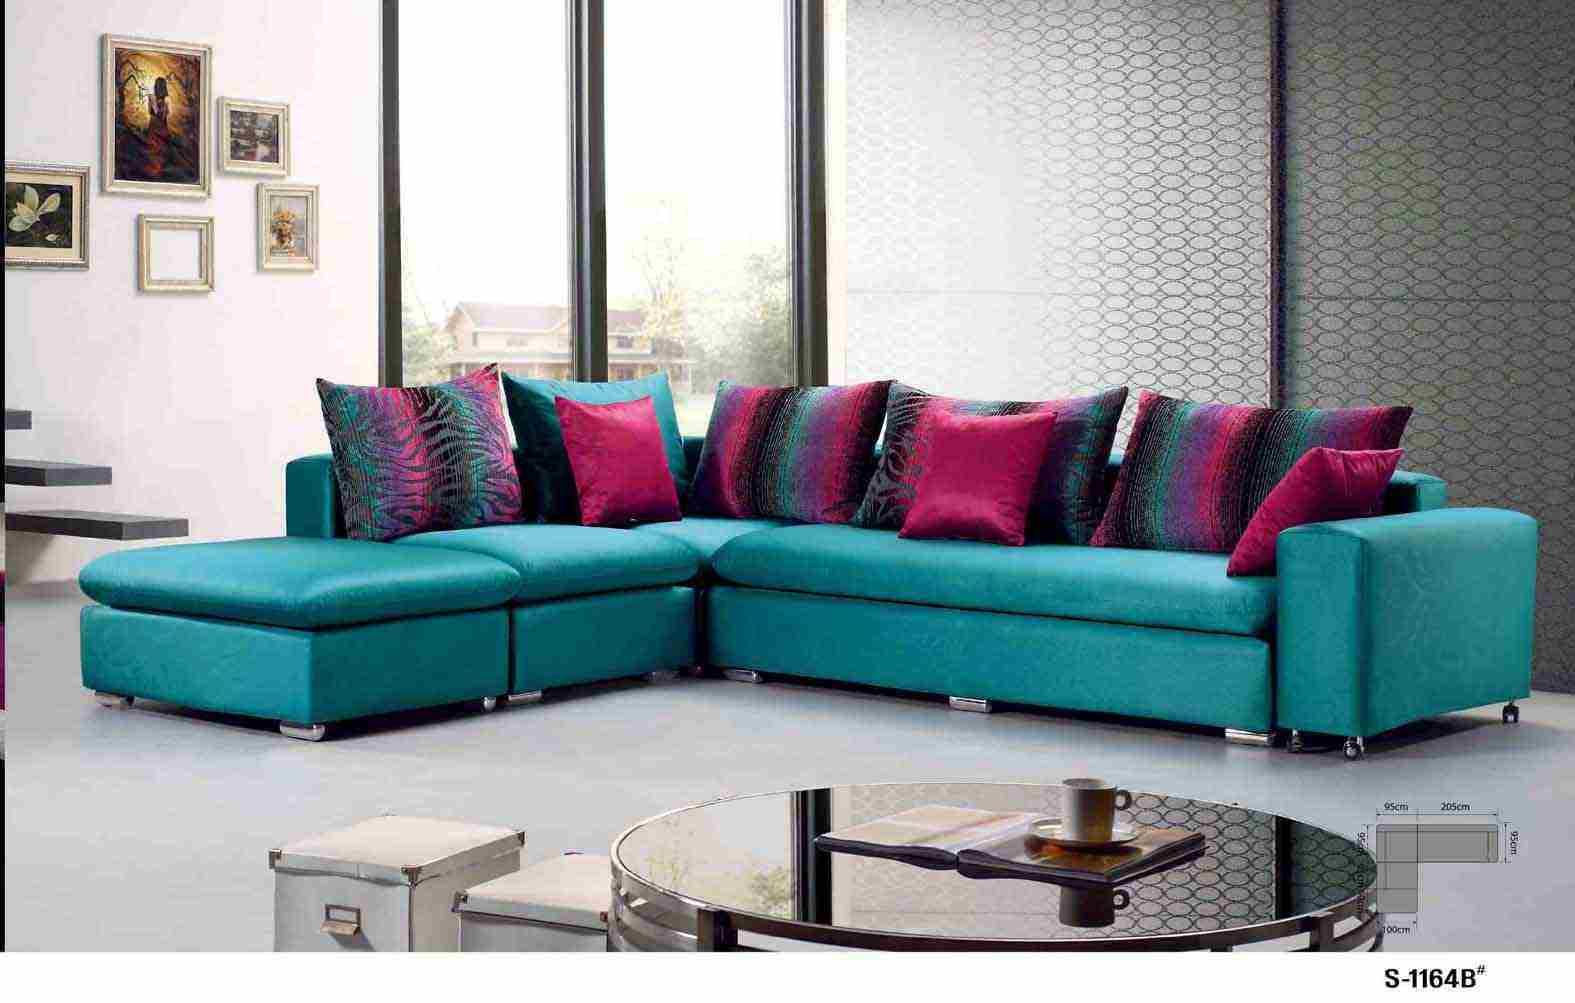 China Colorful Fabric Sofa (S 1164B) – China Sofa, Fabric Sofa Regarding Colorful Sofas And Chairs (View 10 of 15)